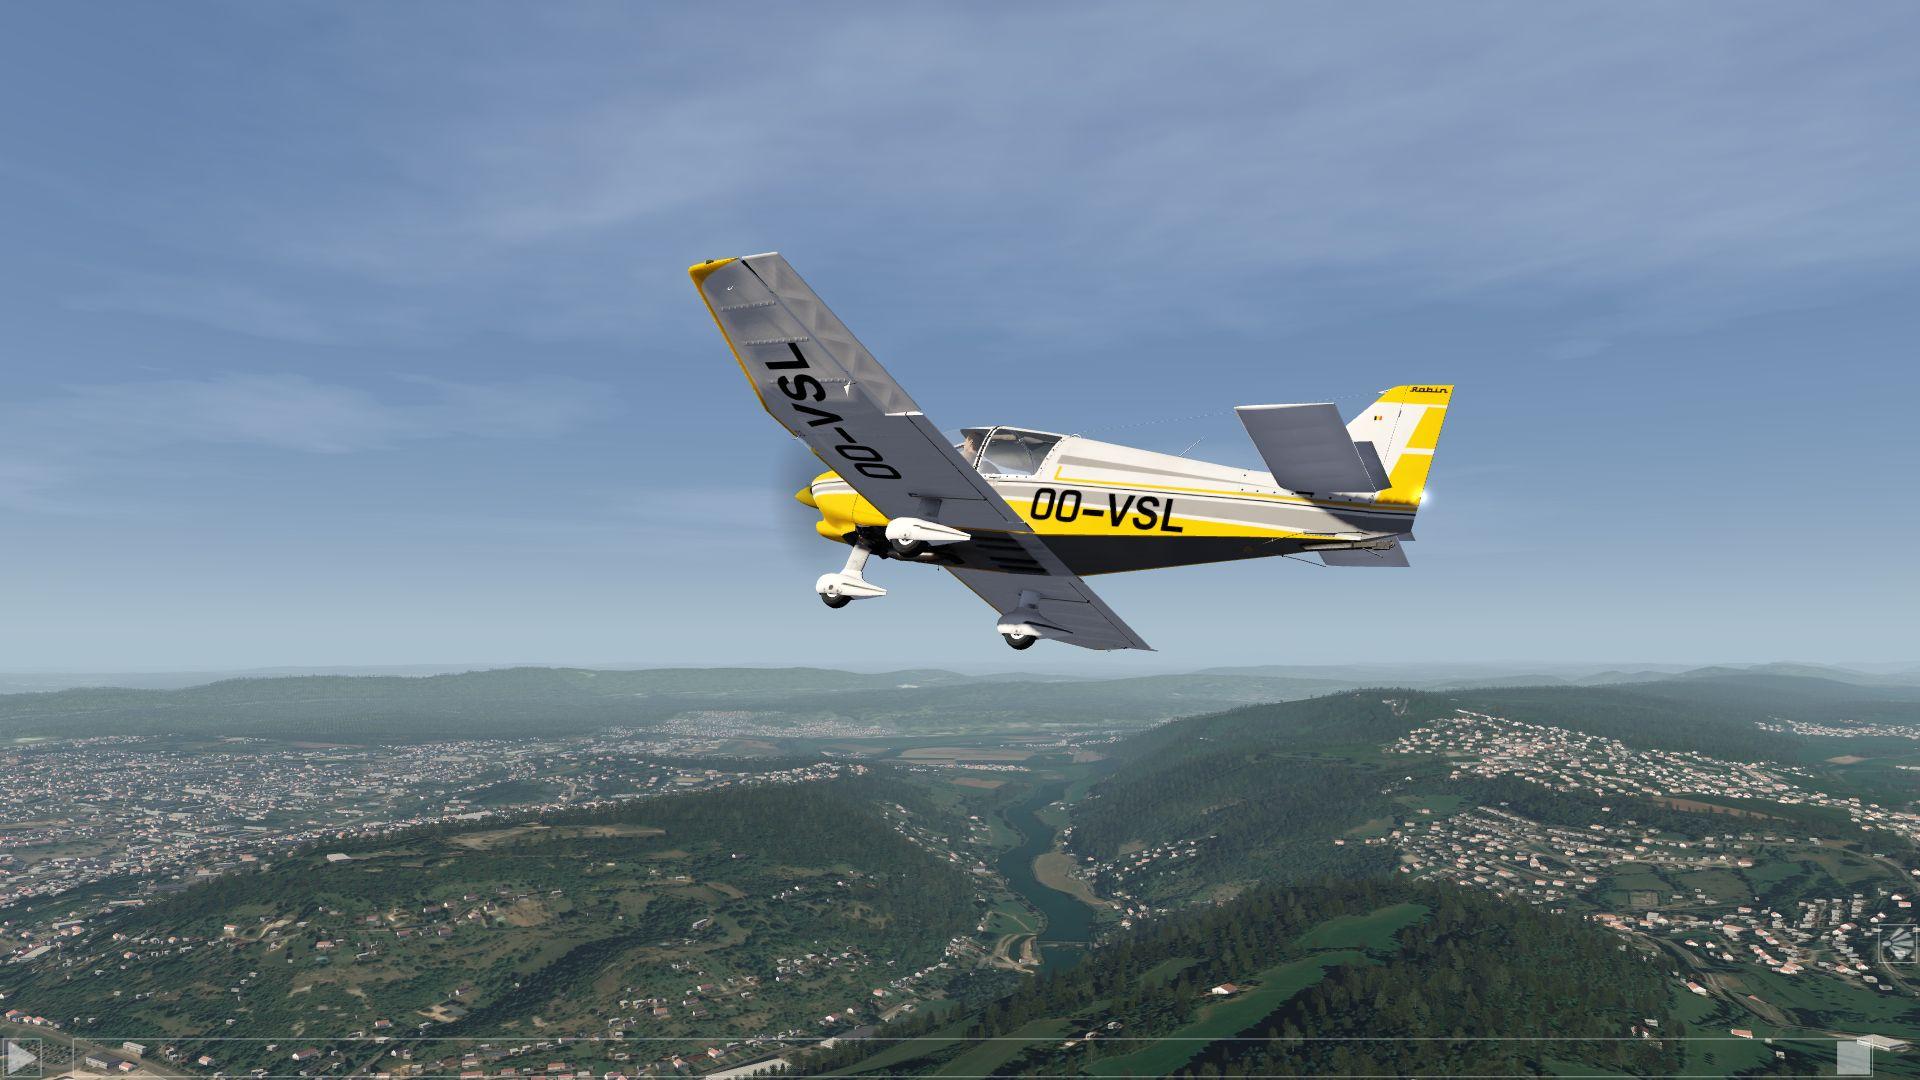 http://www.pilote-virtuel.com/img/gallery/1517173369.jpg